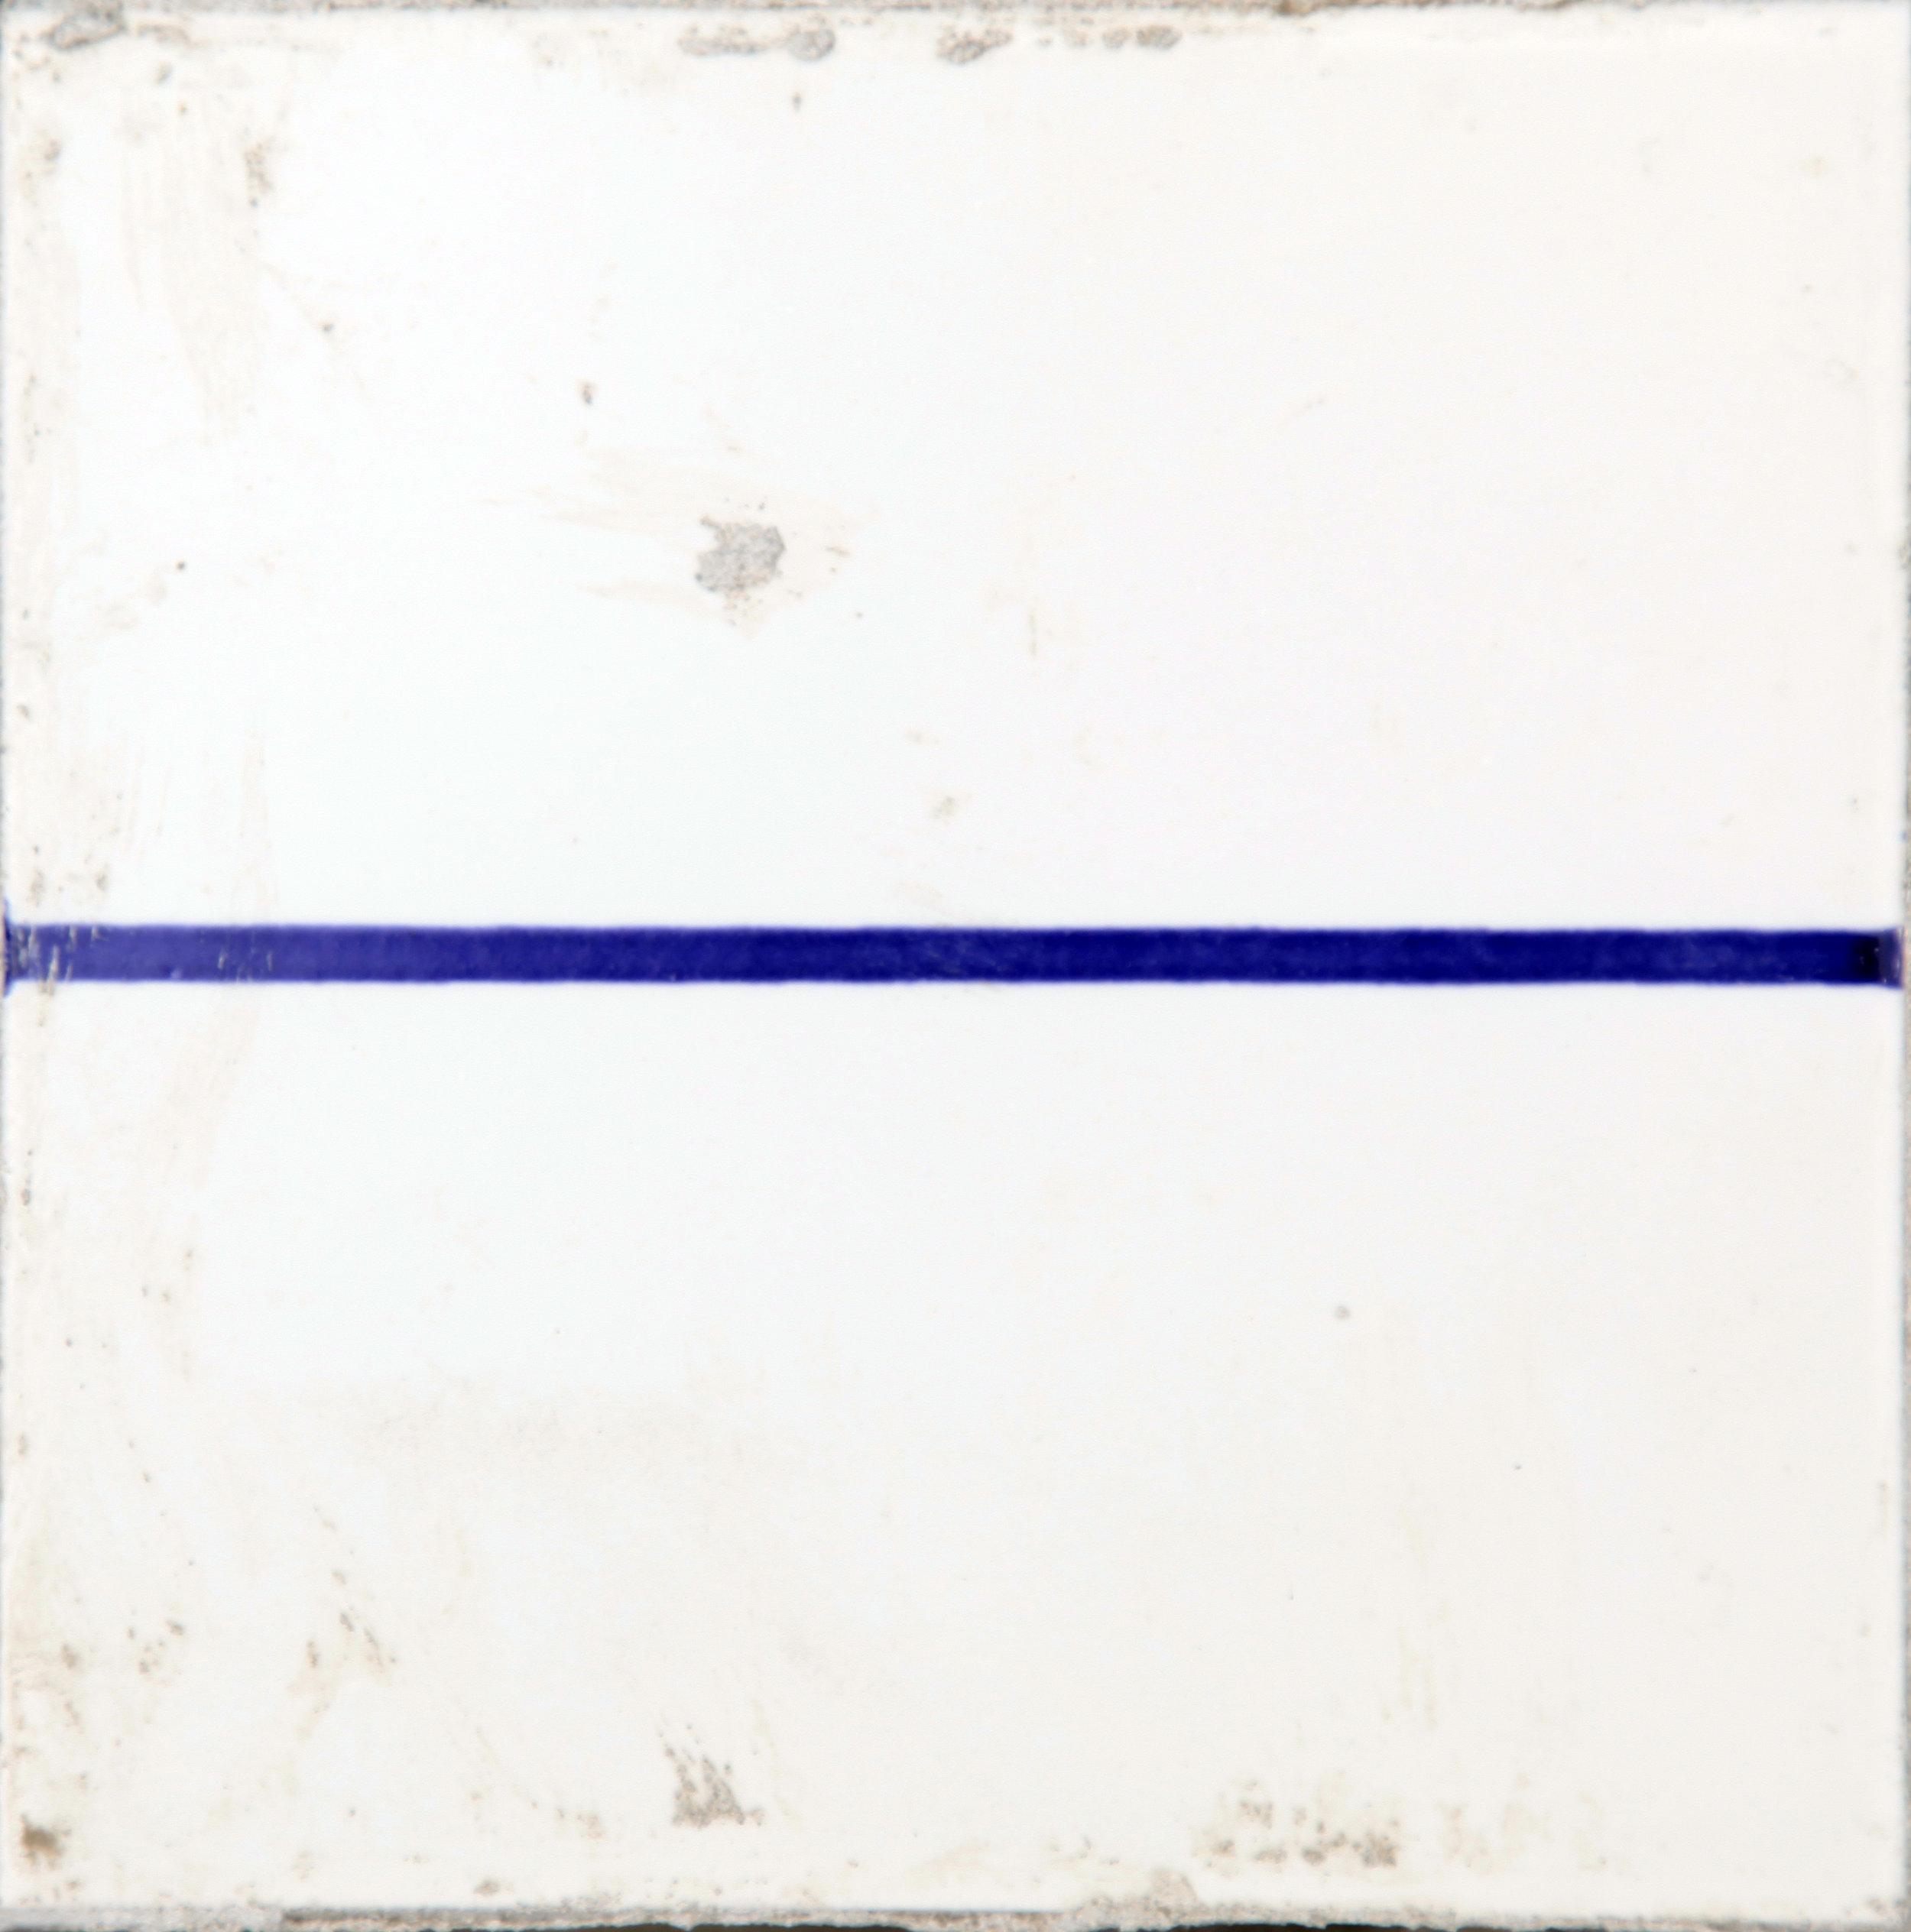 C.J. Chueca,  Body Horizon,  2016, ceramic tile and wood, 6 x 6 x 2 ½ inches SOLD